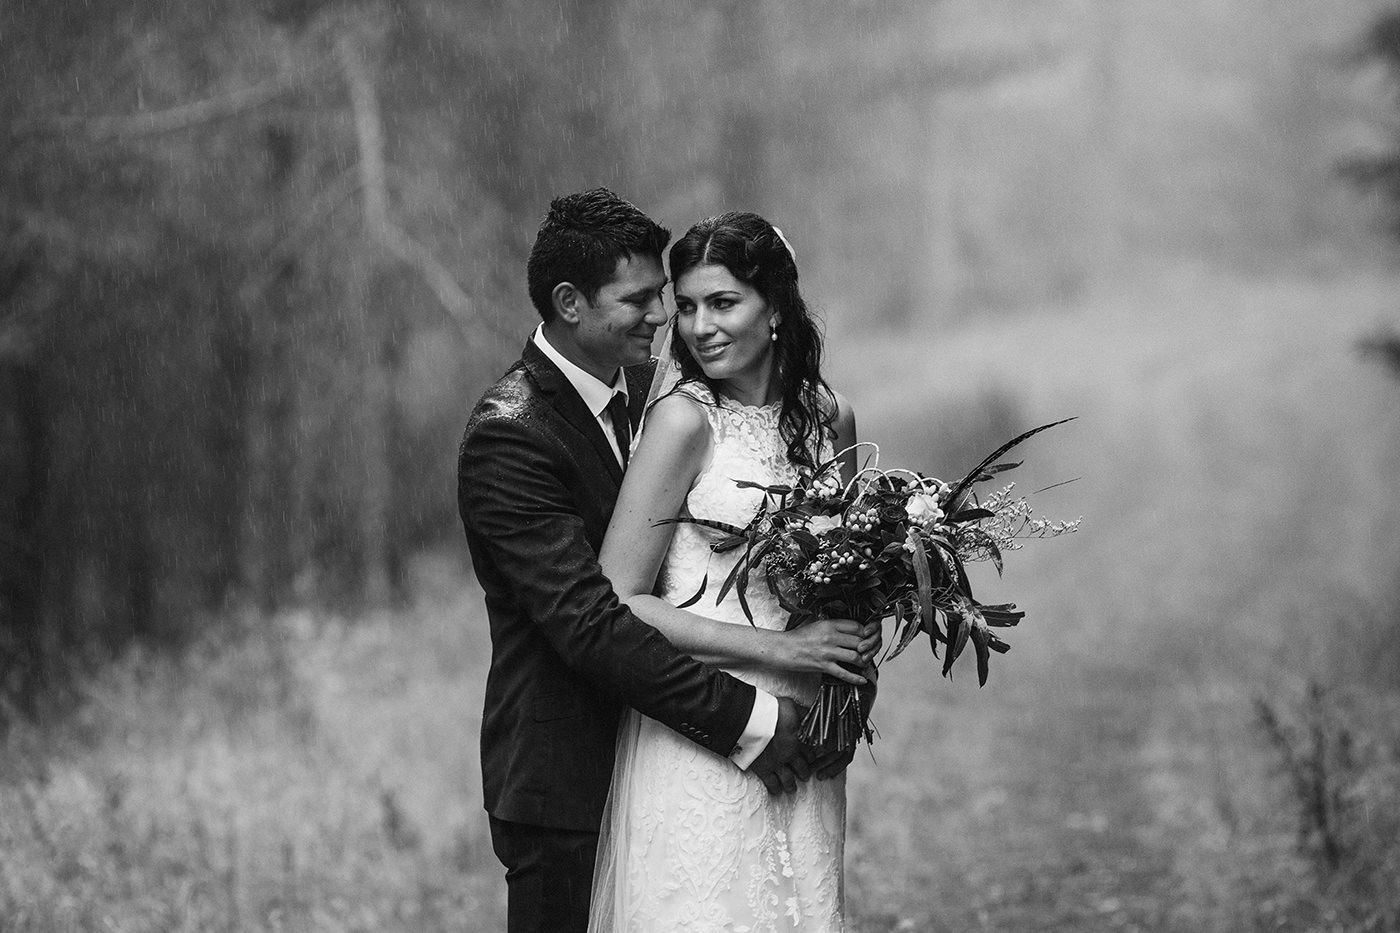 wedding_photographer_nz-00021.jpg